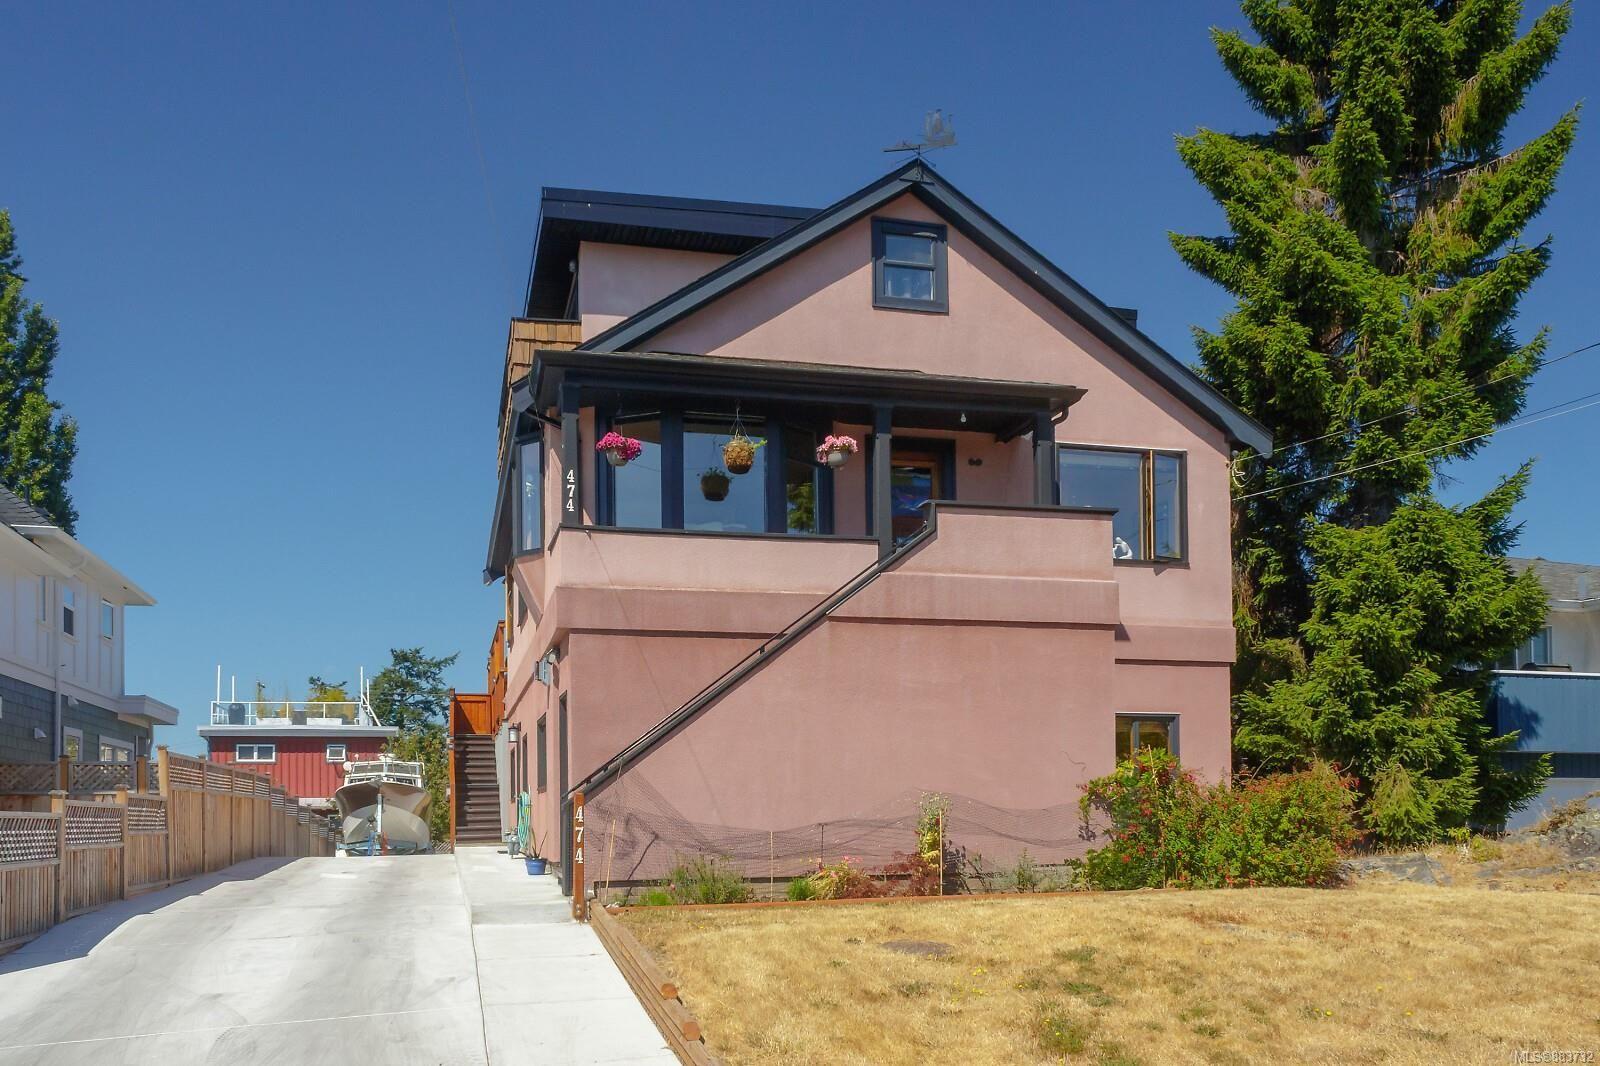 Main Photo: 474 Foster St in : Es Esquimalt House for sale (Esquimalt)  : MLS®# 883732